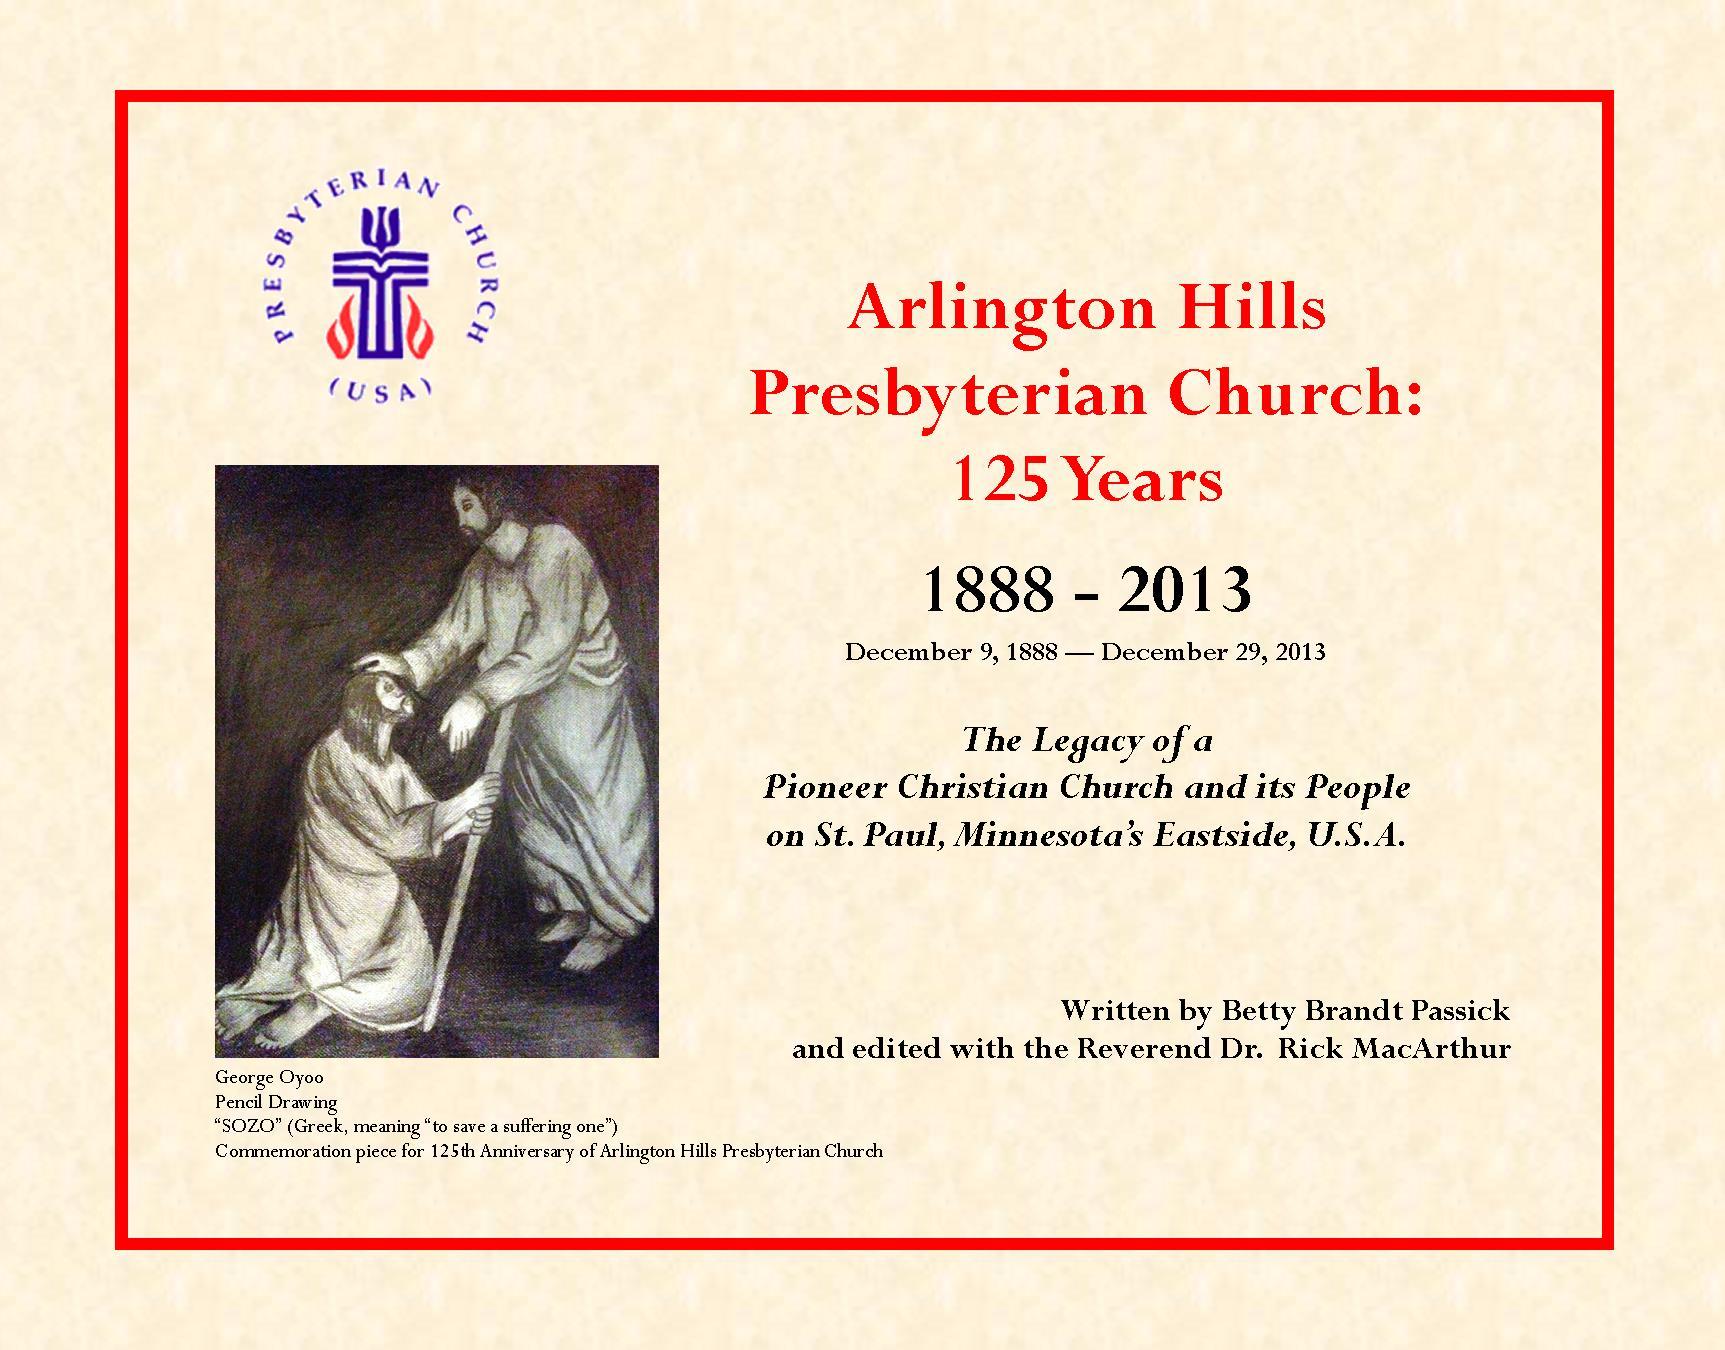 Arlington Hills Presbyterian Church